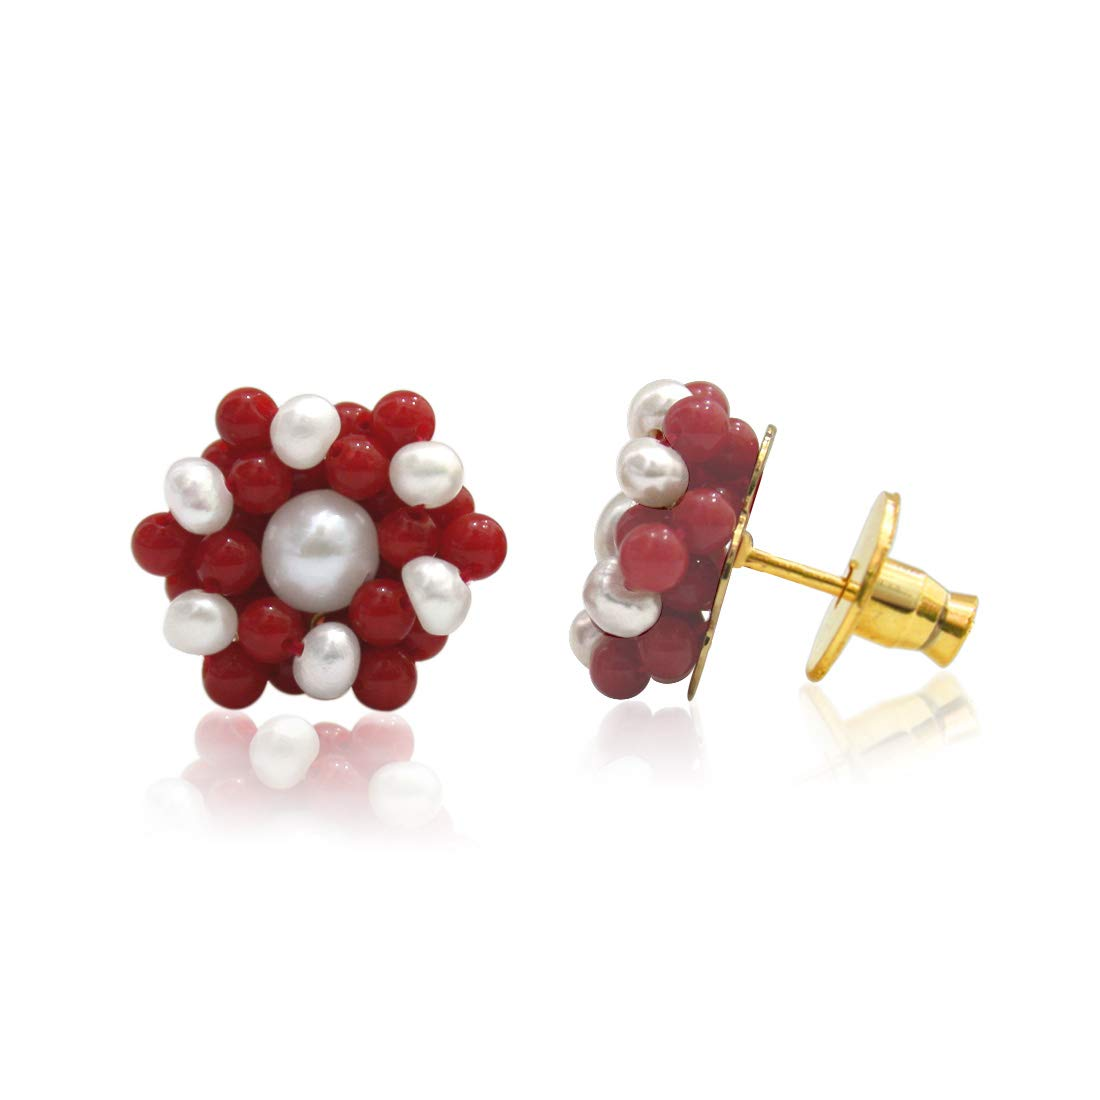 Real Freshwater Pearl & Red Coral Beads Kuda Jodi Earrings for Women (SE108)